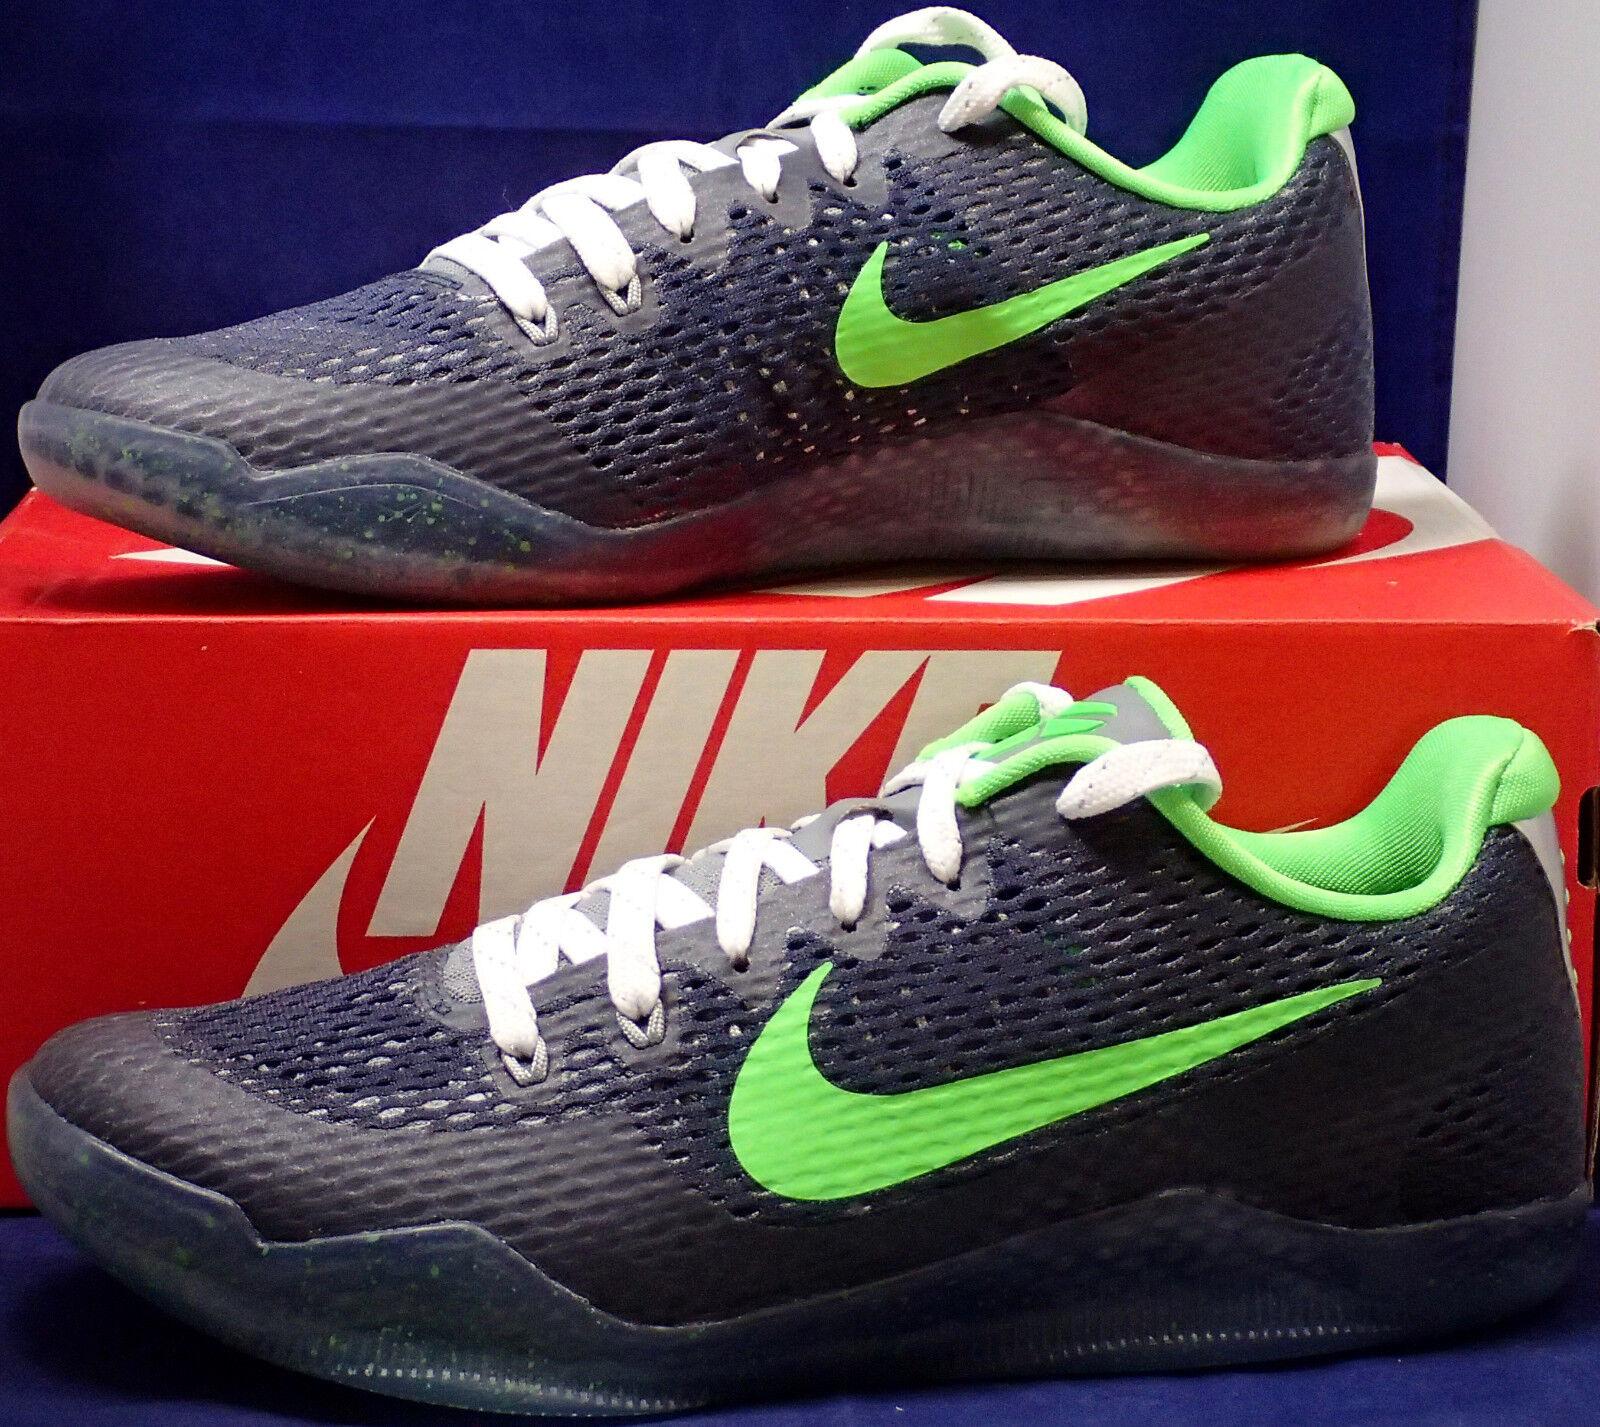 Nike Kobe XI 11 Mamba Day QS QS Day iD Seattle Seahawks Blue Green SZ 9.5 (865773-996) 3822ce